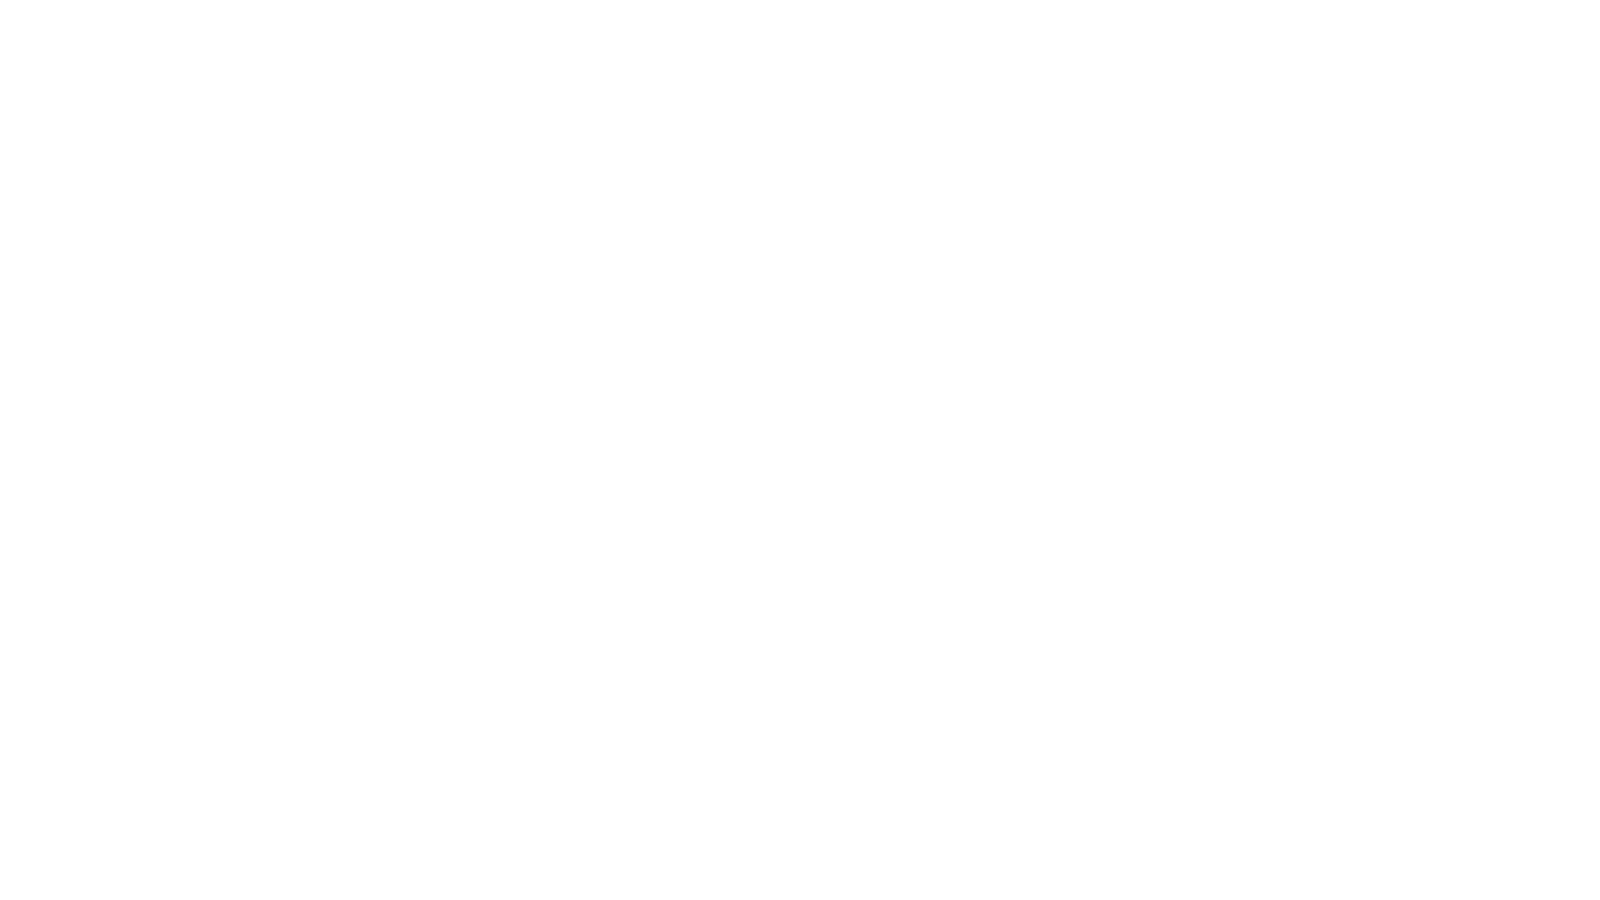 Informasi PPDB Tahun Pelajaran 2021/2022 Silahkan komentar jika ada yang ingin ditanyakan dikolom komentar ya  Jangan Lupa Like, Comment and Subscribe Channel SMKN 3 SAMPIT : Youtube : https://www.youtube.com/channel/UCP1VgJPziTPLUpPlZ0-ELmQ instagram : @official_smkn3sampit Facebook : https://facebook.com/smkn3spt Website : https://smkn3-spt.sch.id